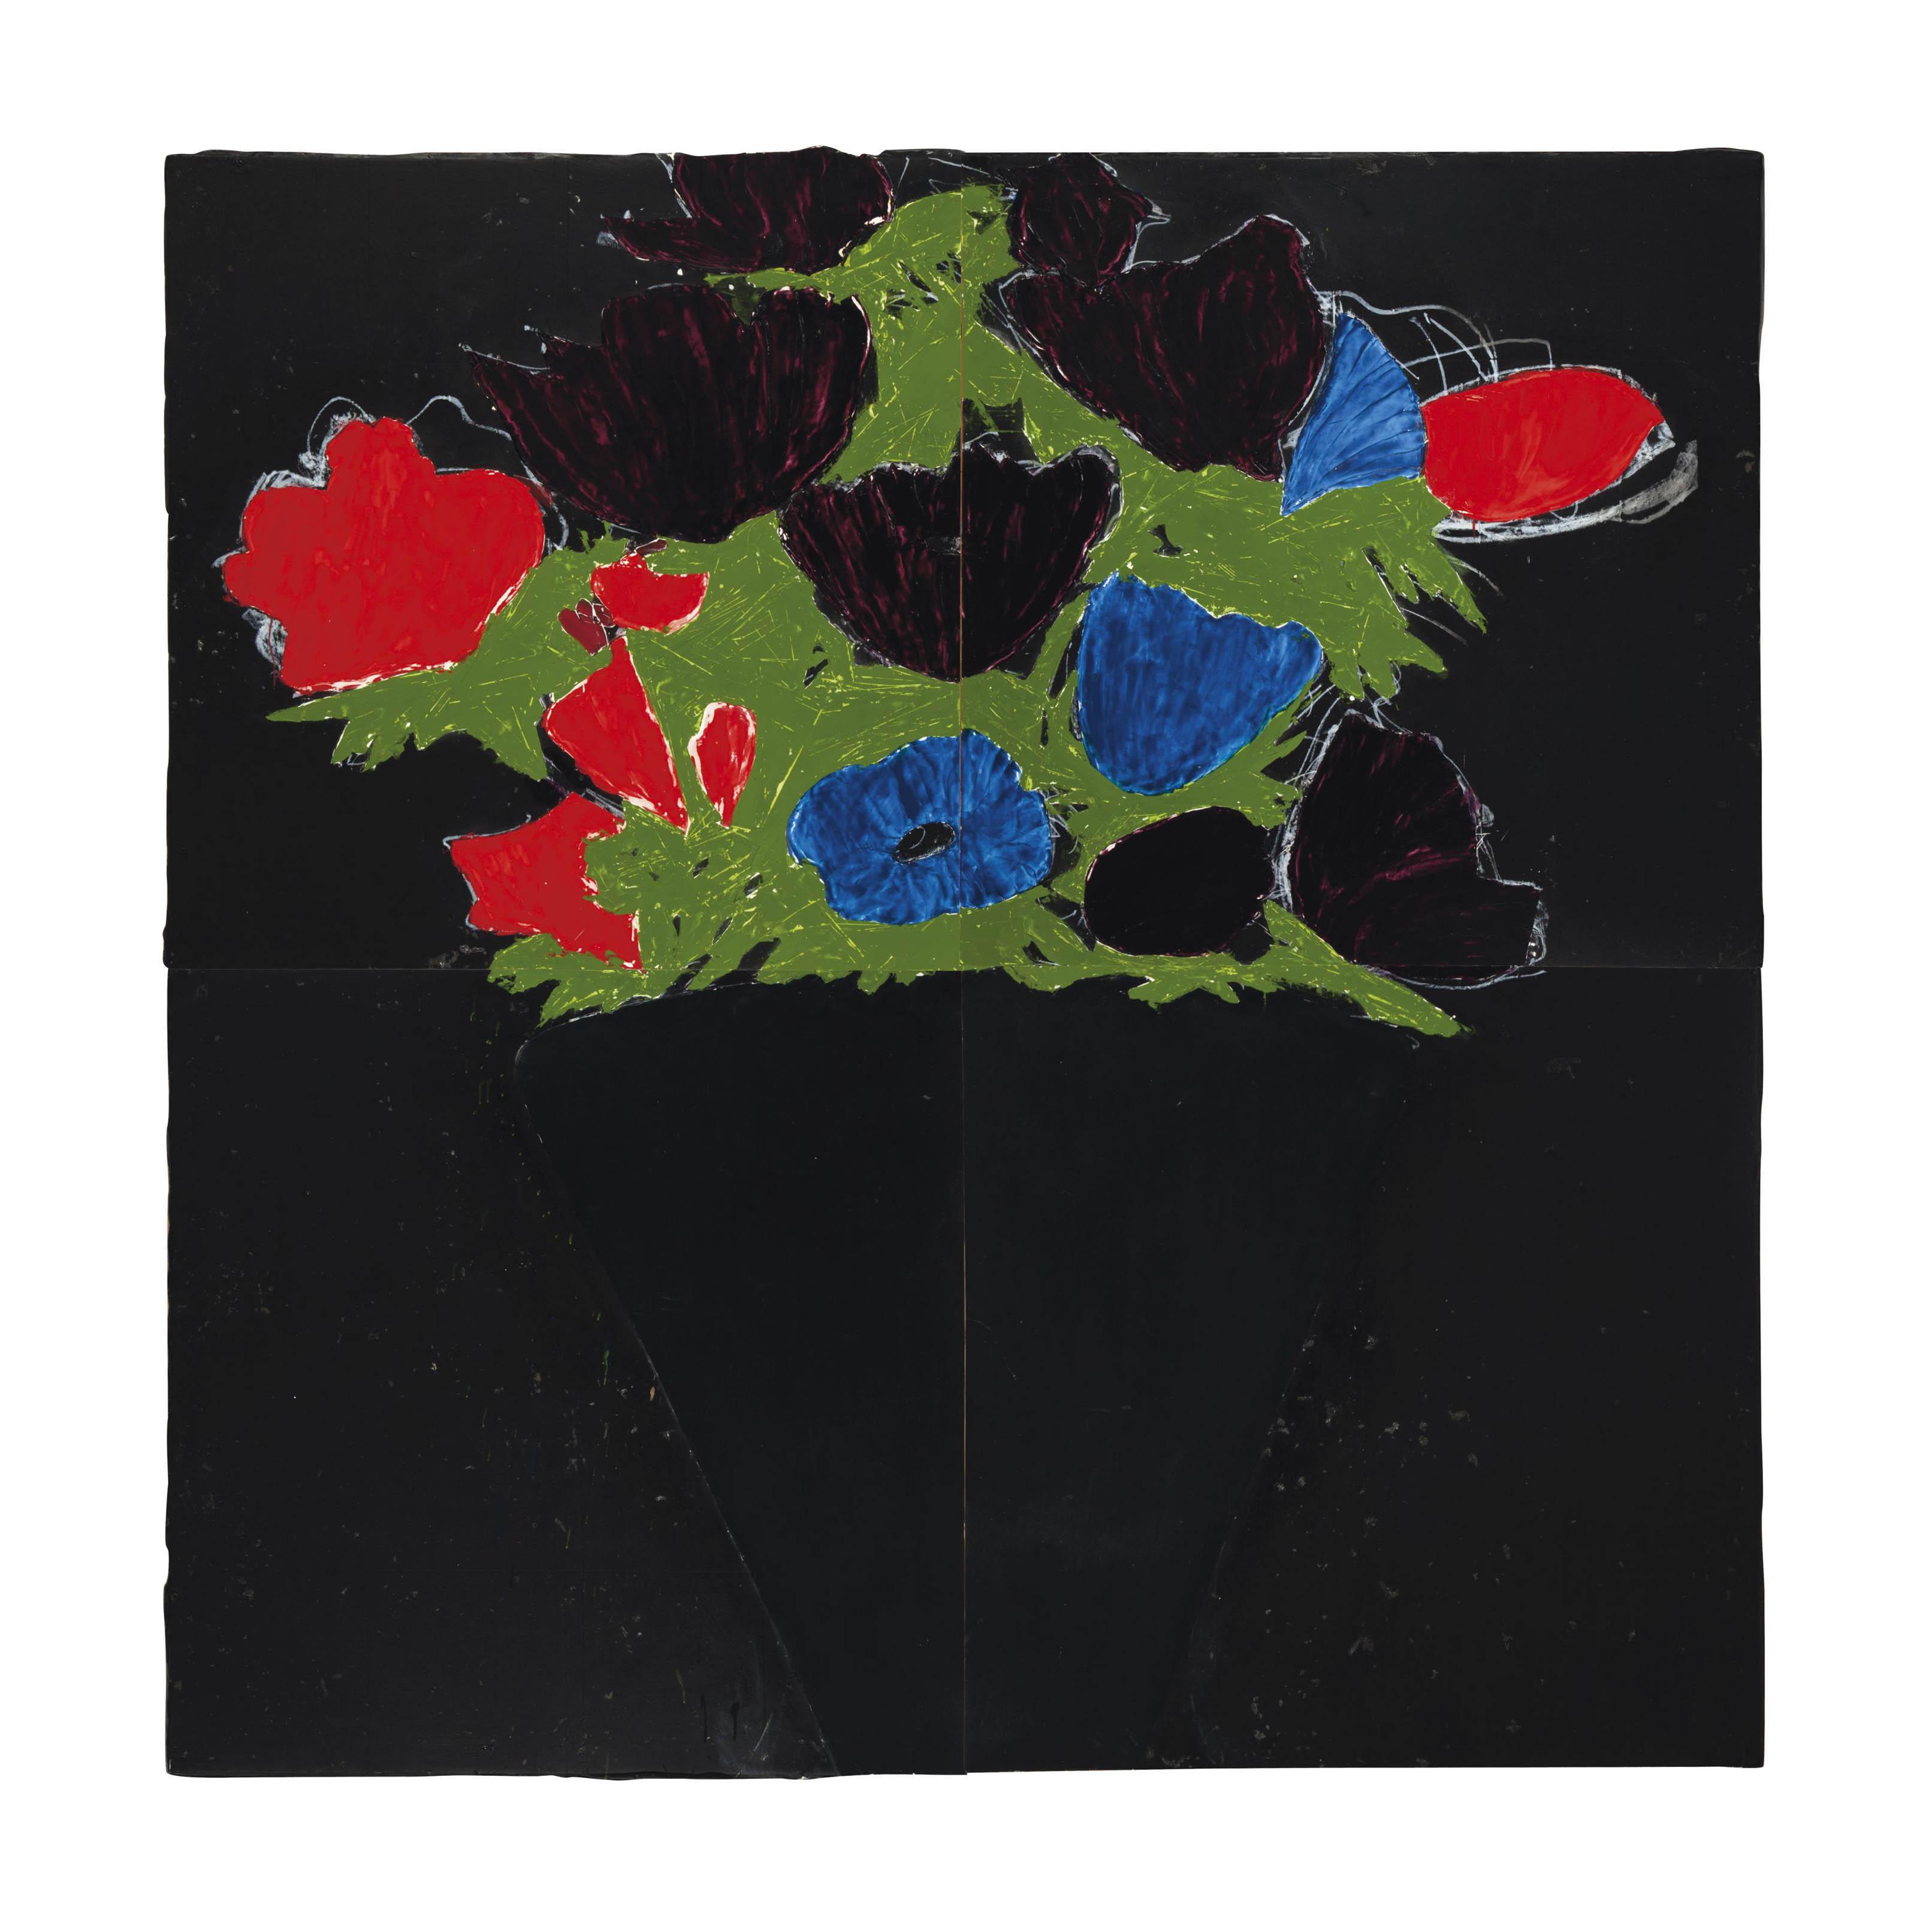 Anemones in a Black Vase, May 19, 1988